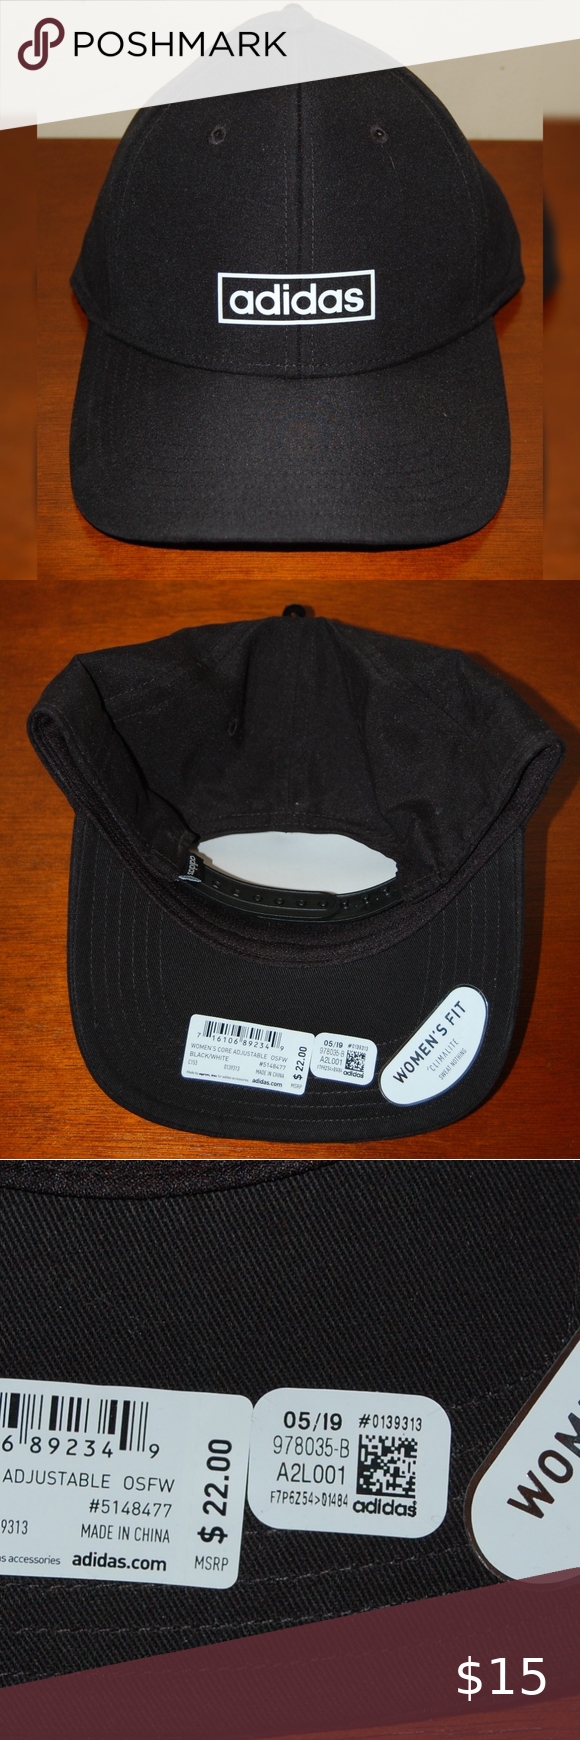 disco taza para justificar  Adidas Hat in 2020 | Adidas hat, Adidas, Hats